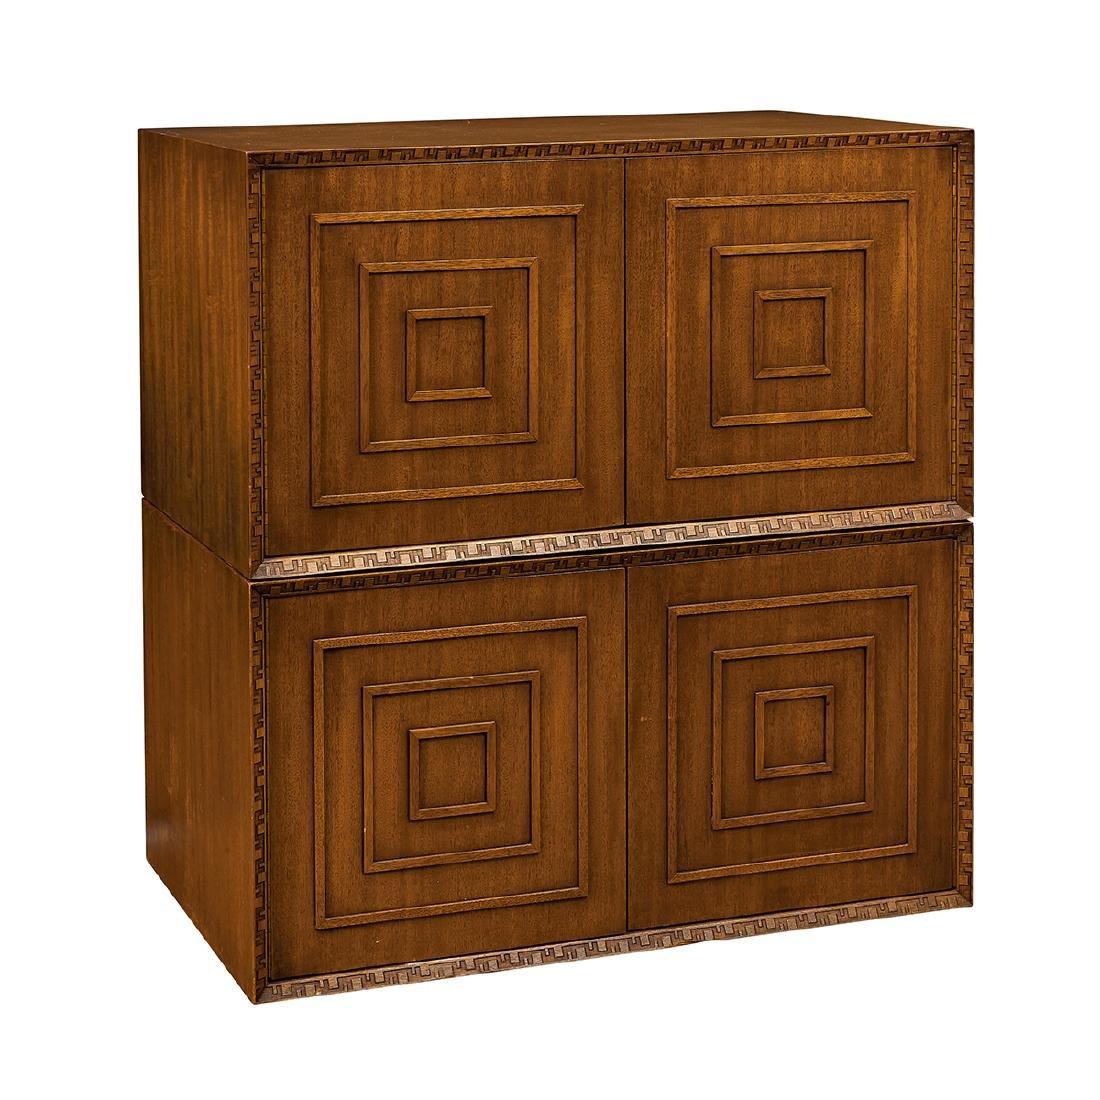 Frank L. Wright Heritage Henredon Cabinets, Pair